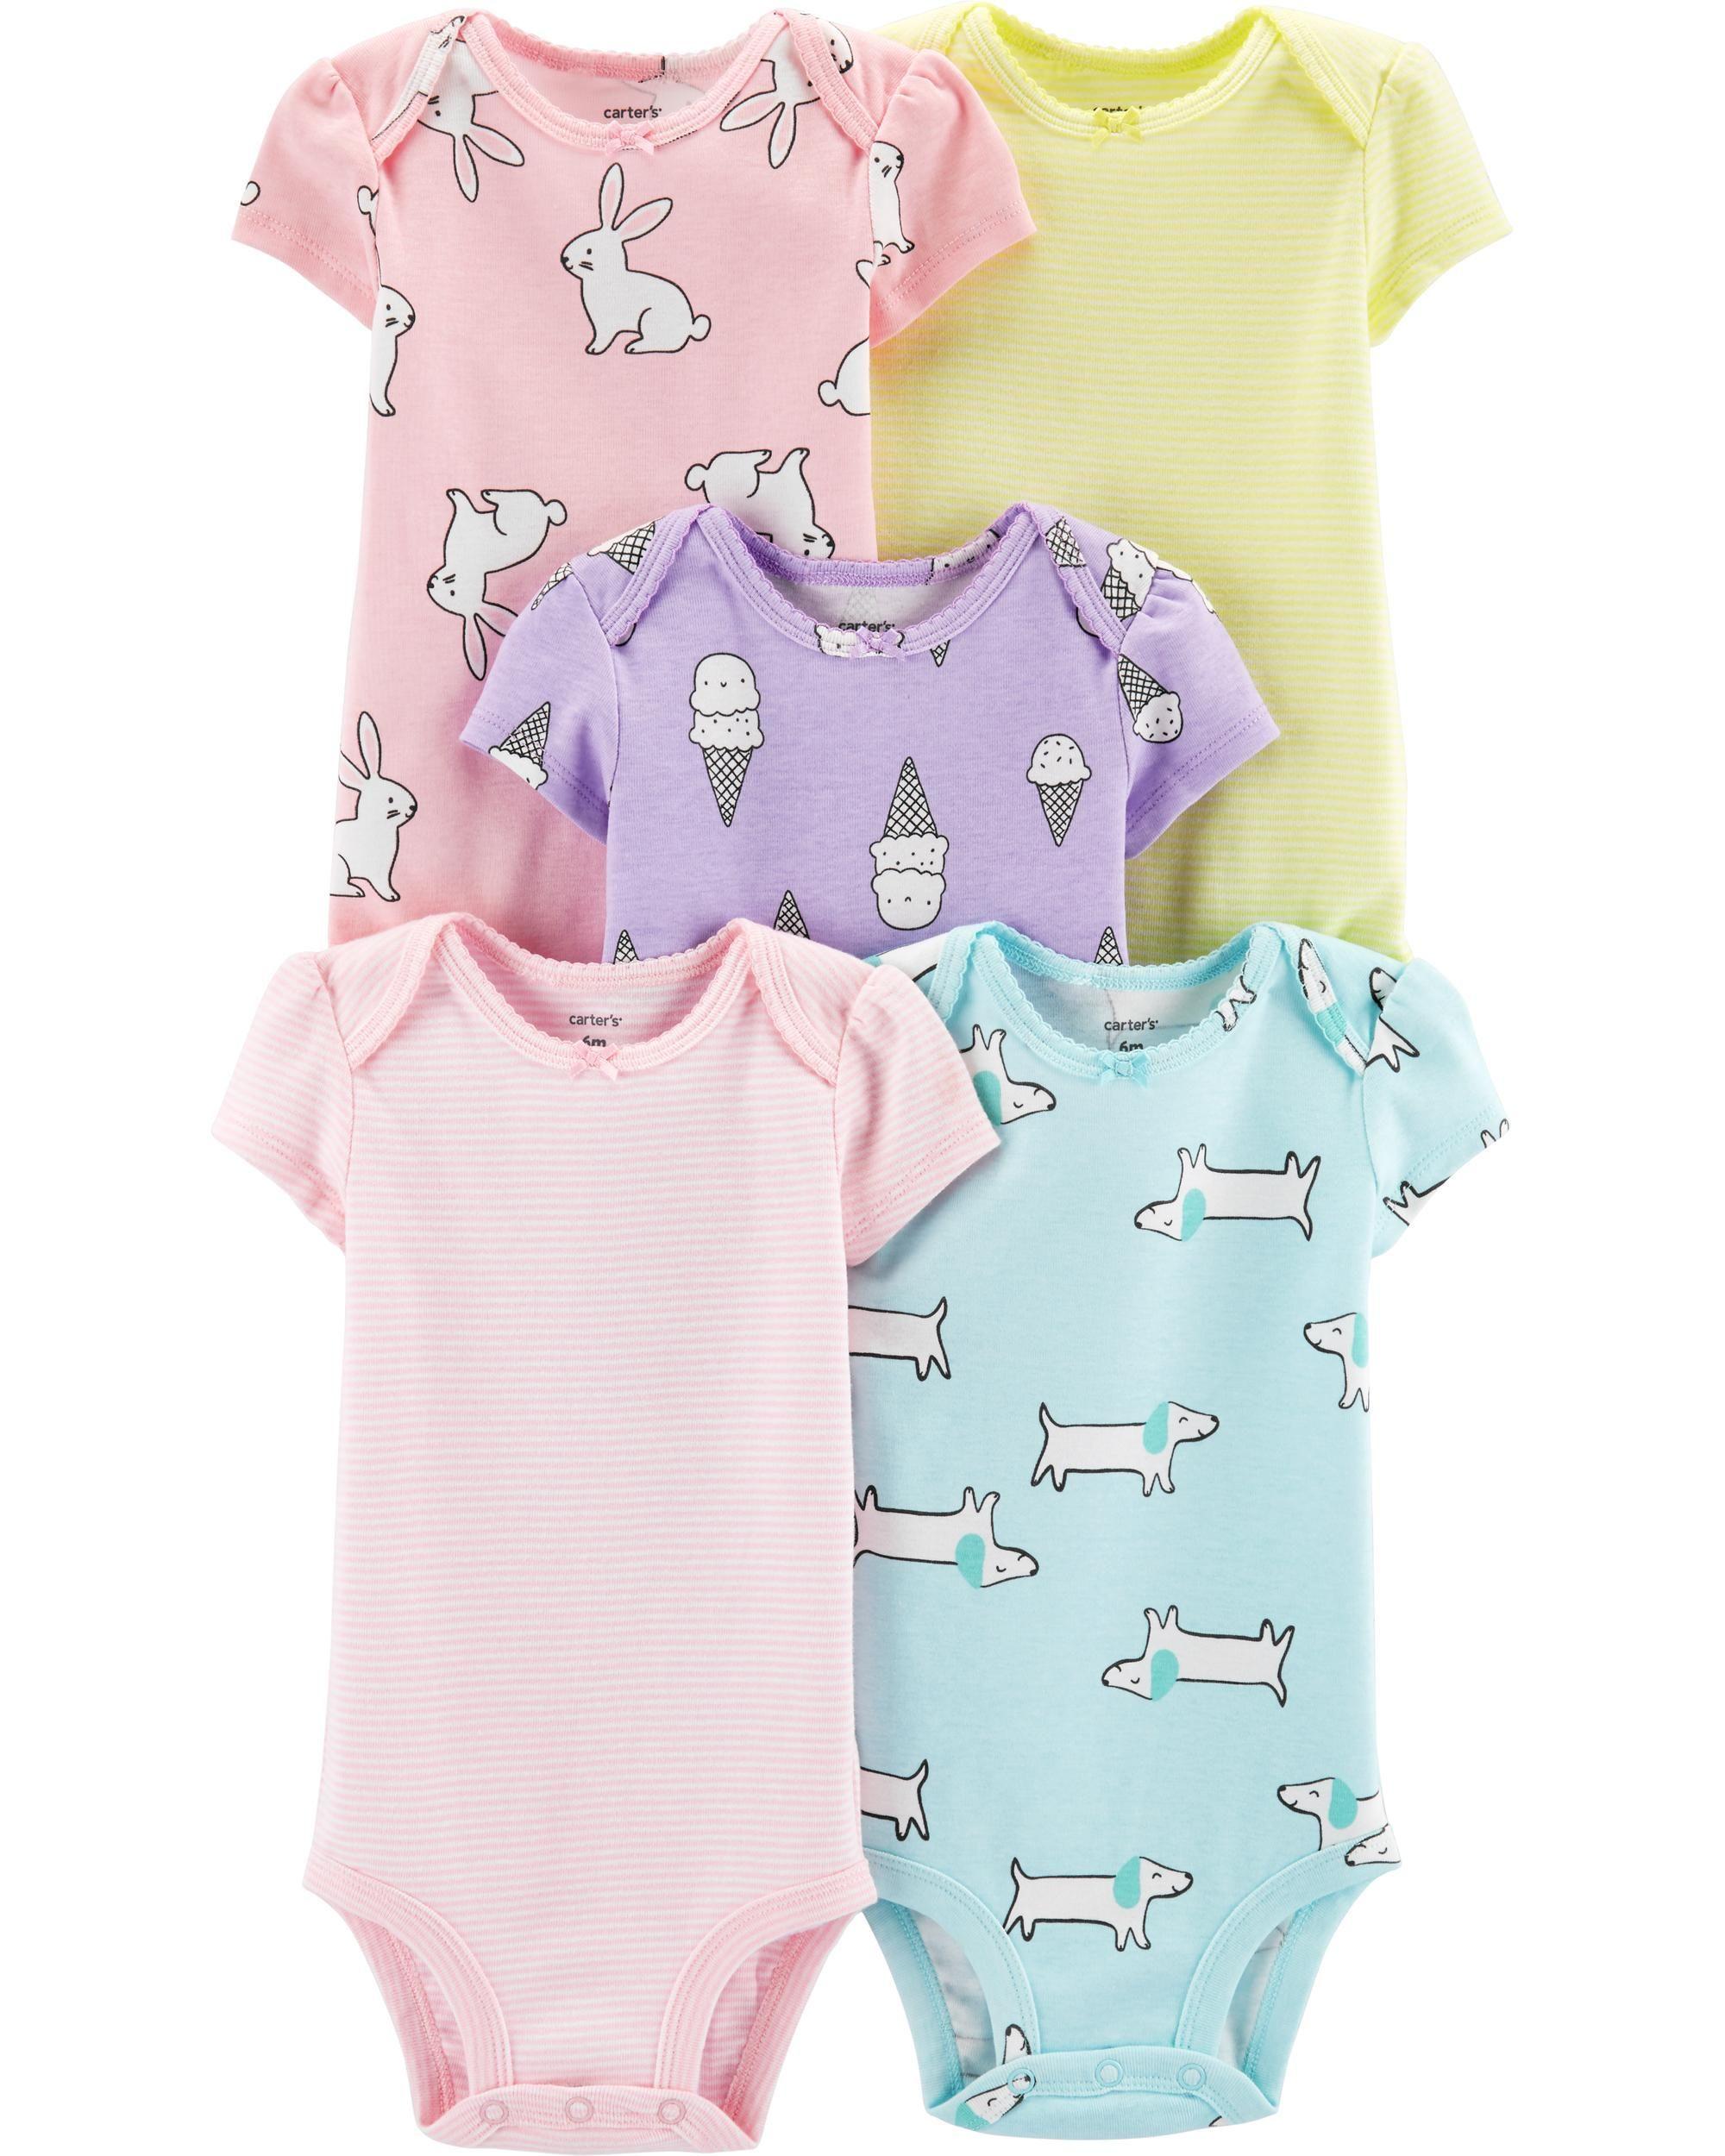 9c05fde6b823 5-Pack Animal & Ice Cream Original Bodysuits   Closet - Baby girl ...